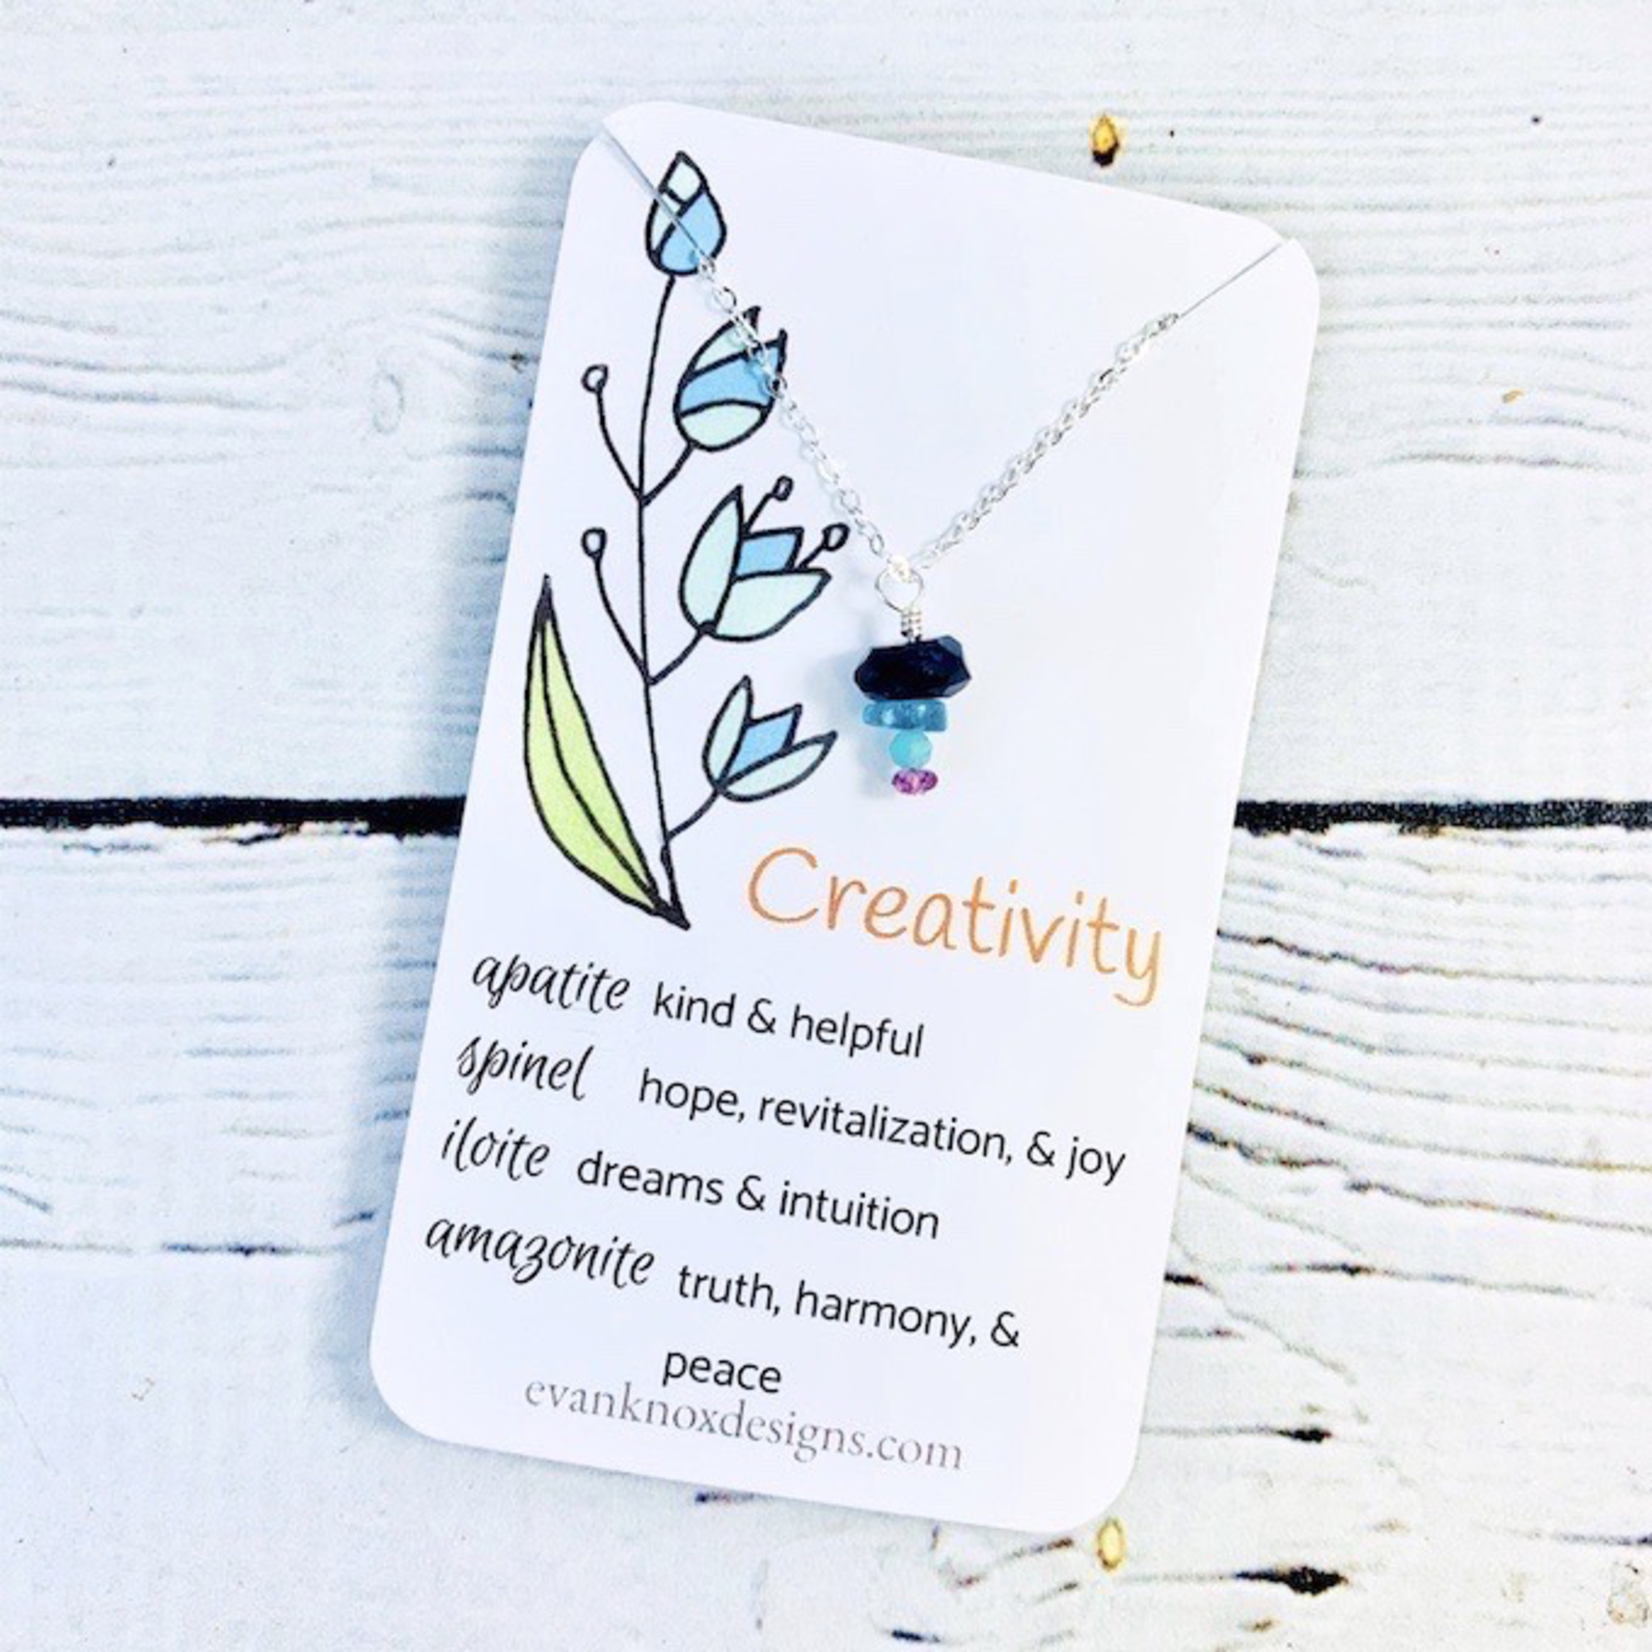 Handmade Silver Necklace with creativity gemstones